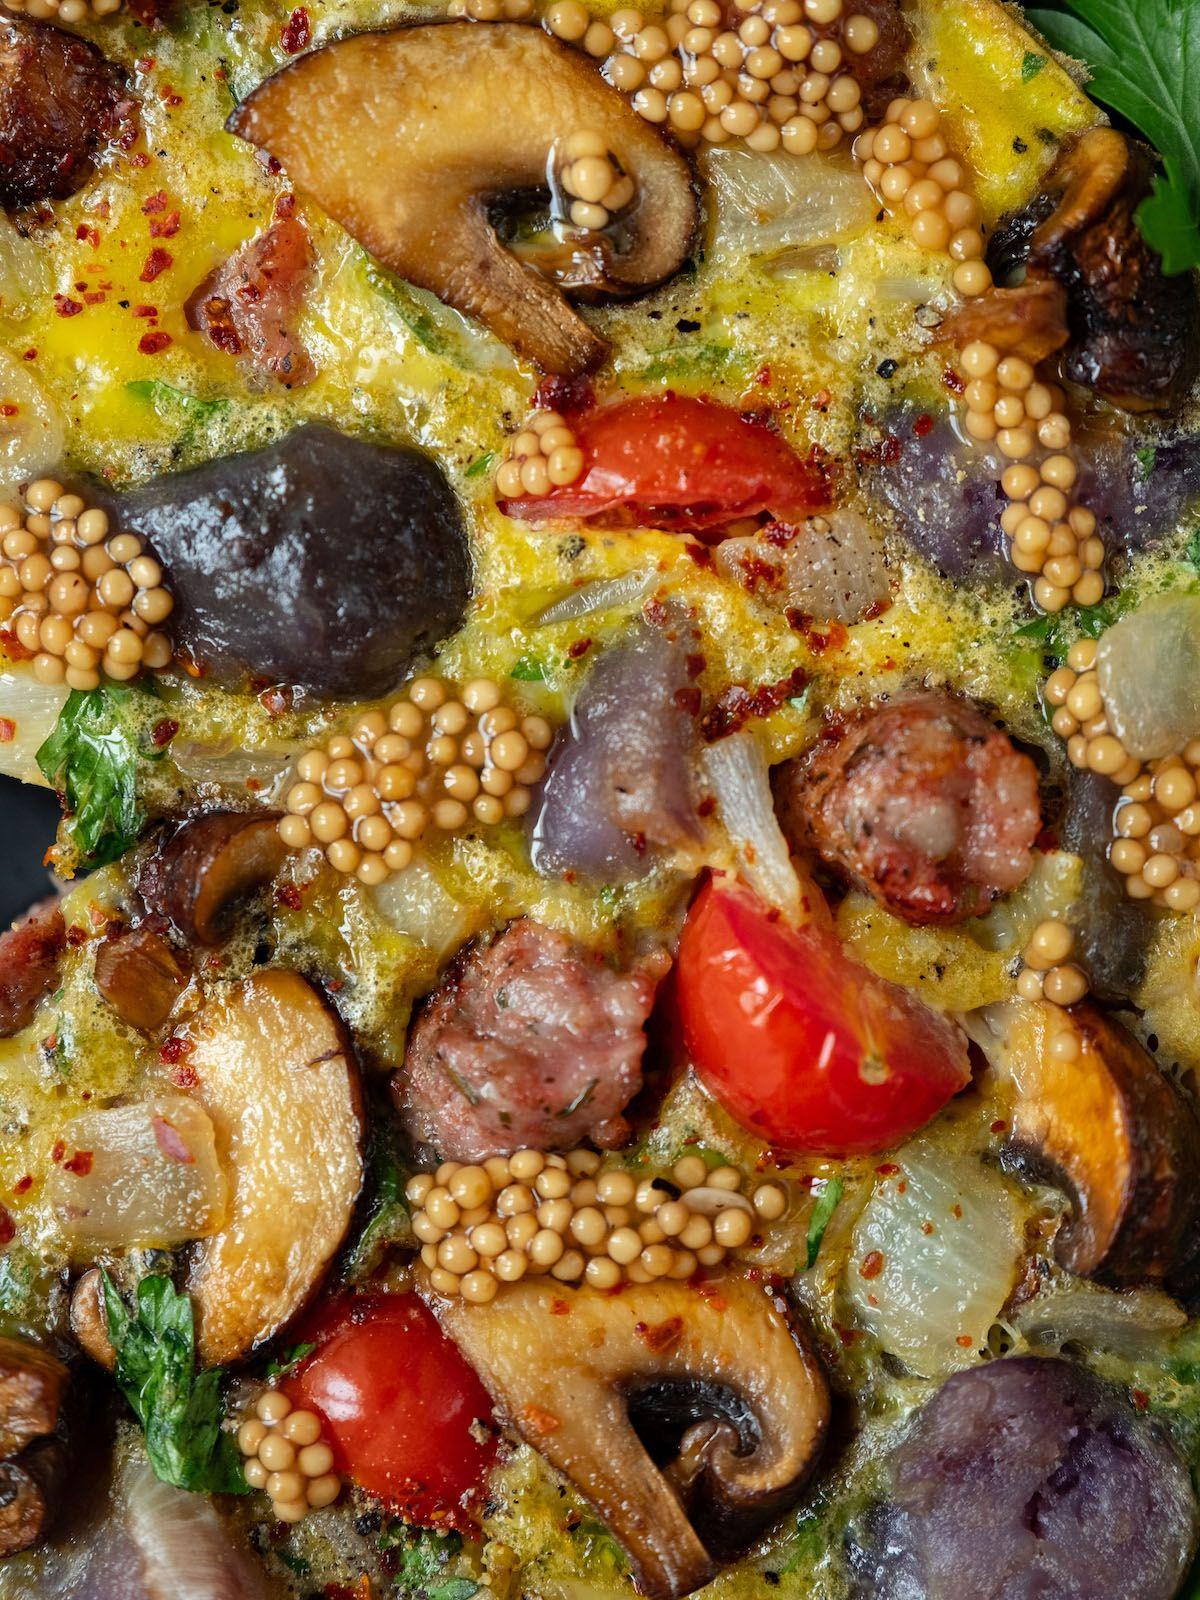 Rezept, Foodblog, Abput Fuel, Senfcaviar, Tortilla